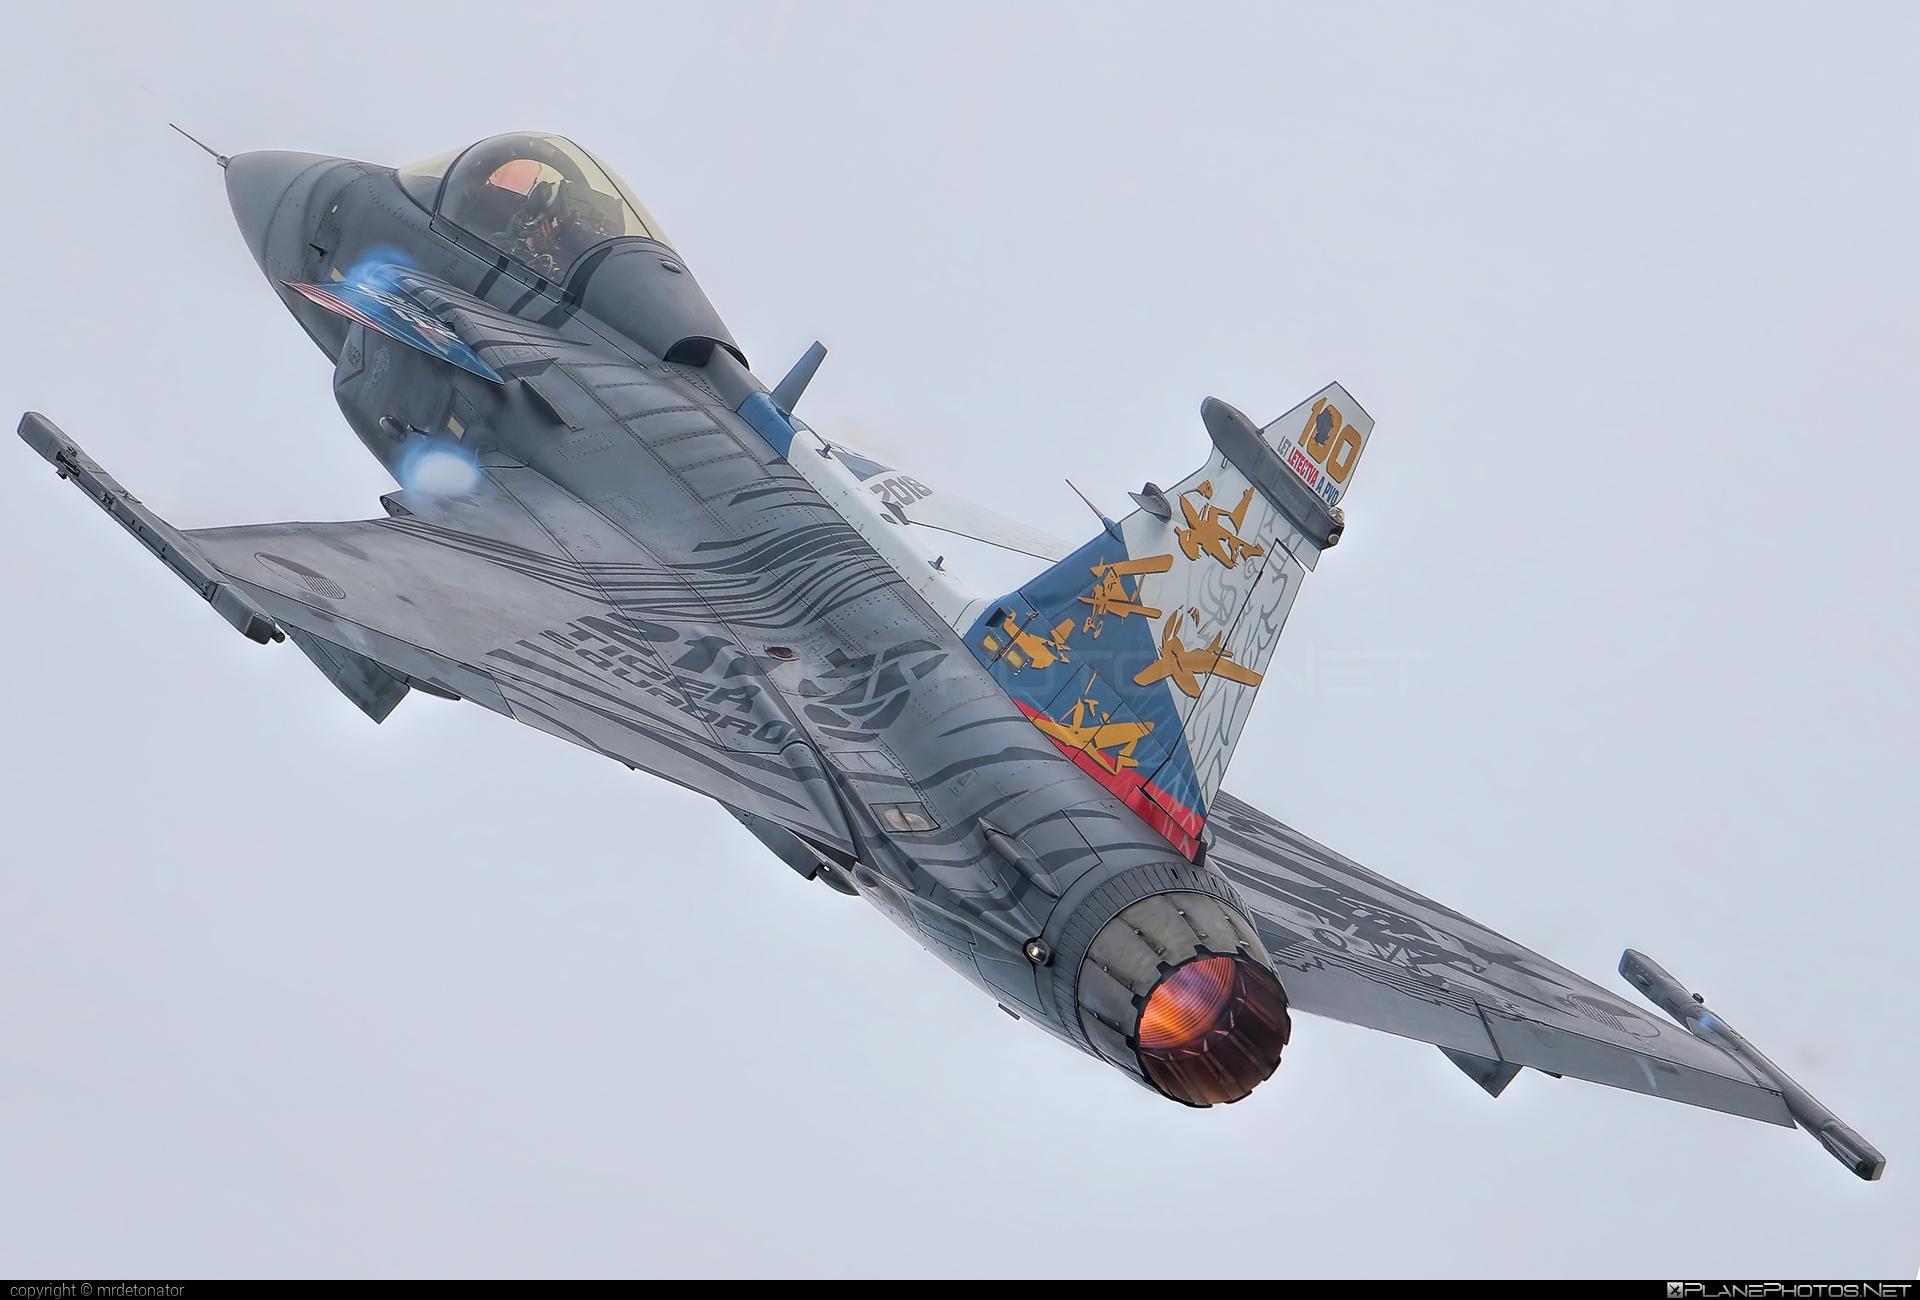 Saab JAS 39C Gripen - 9234 operated by Vzdušné síly AČR (Czech Air Force) #czechairforce #gripen #jas39 #jas39c #jas39gripen #radomairshow #radomairshow2018 #saab #vzdusnesilyacr